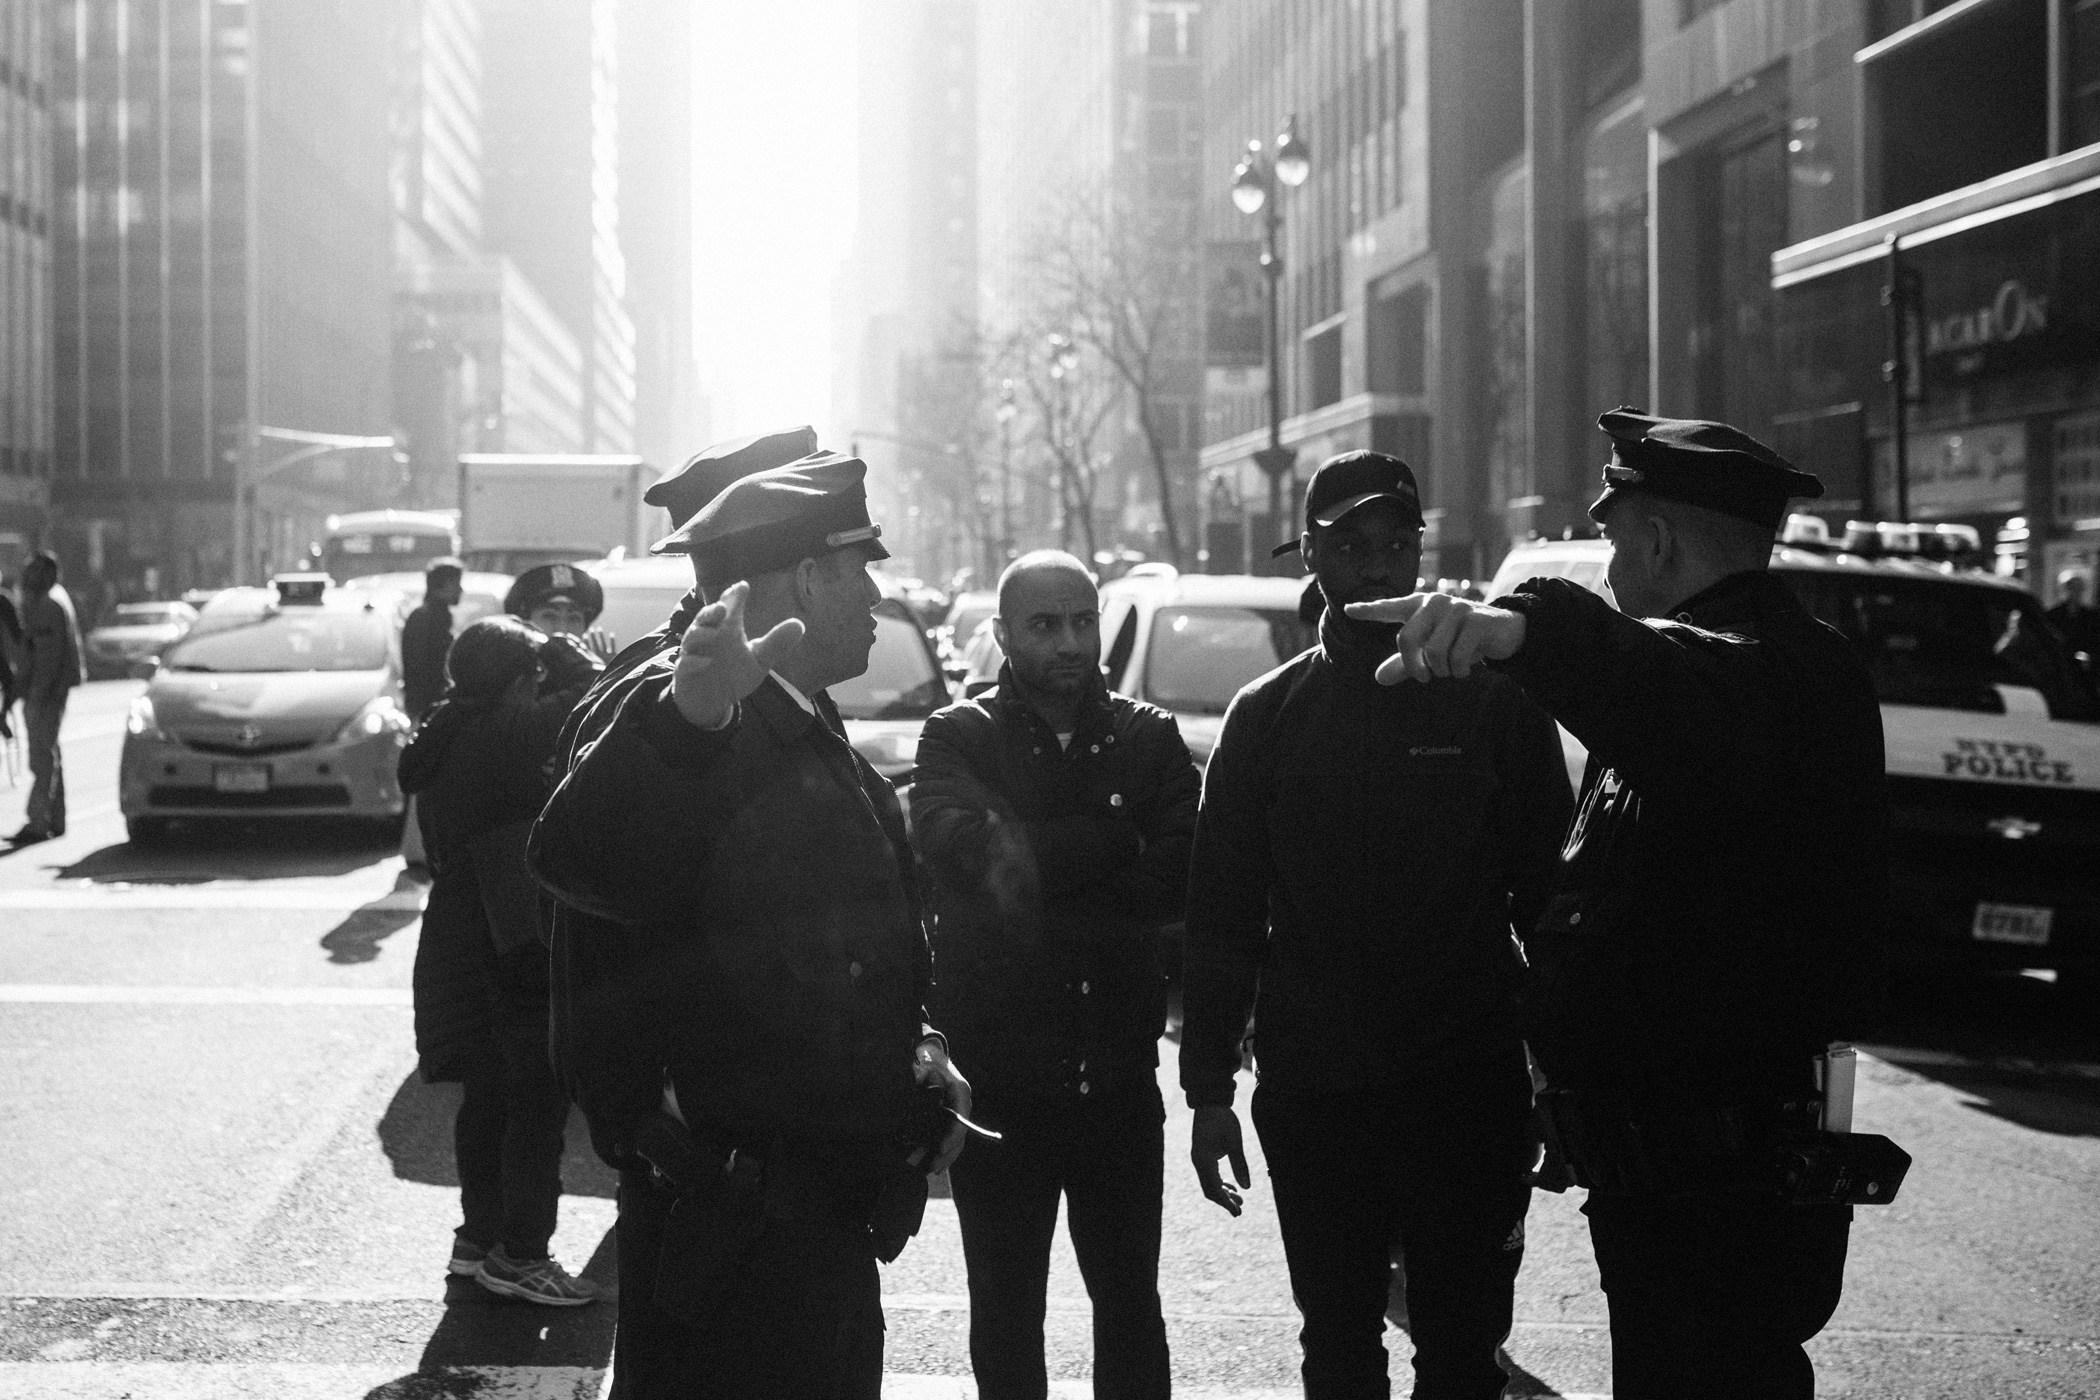 264-womens-march-nyc-2017.jpg